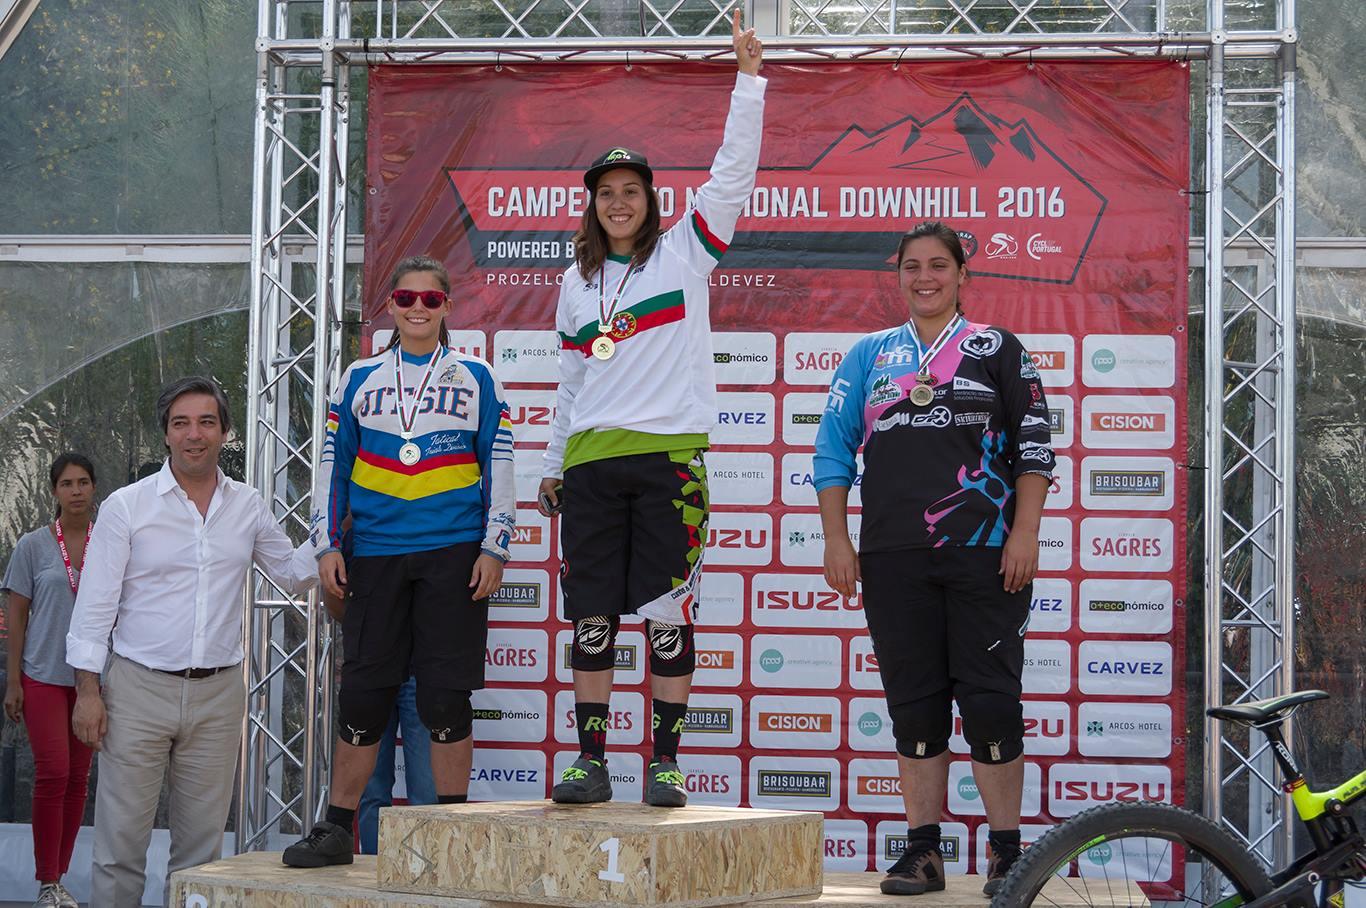 Campeonato Nacional de downhill feminino 2016